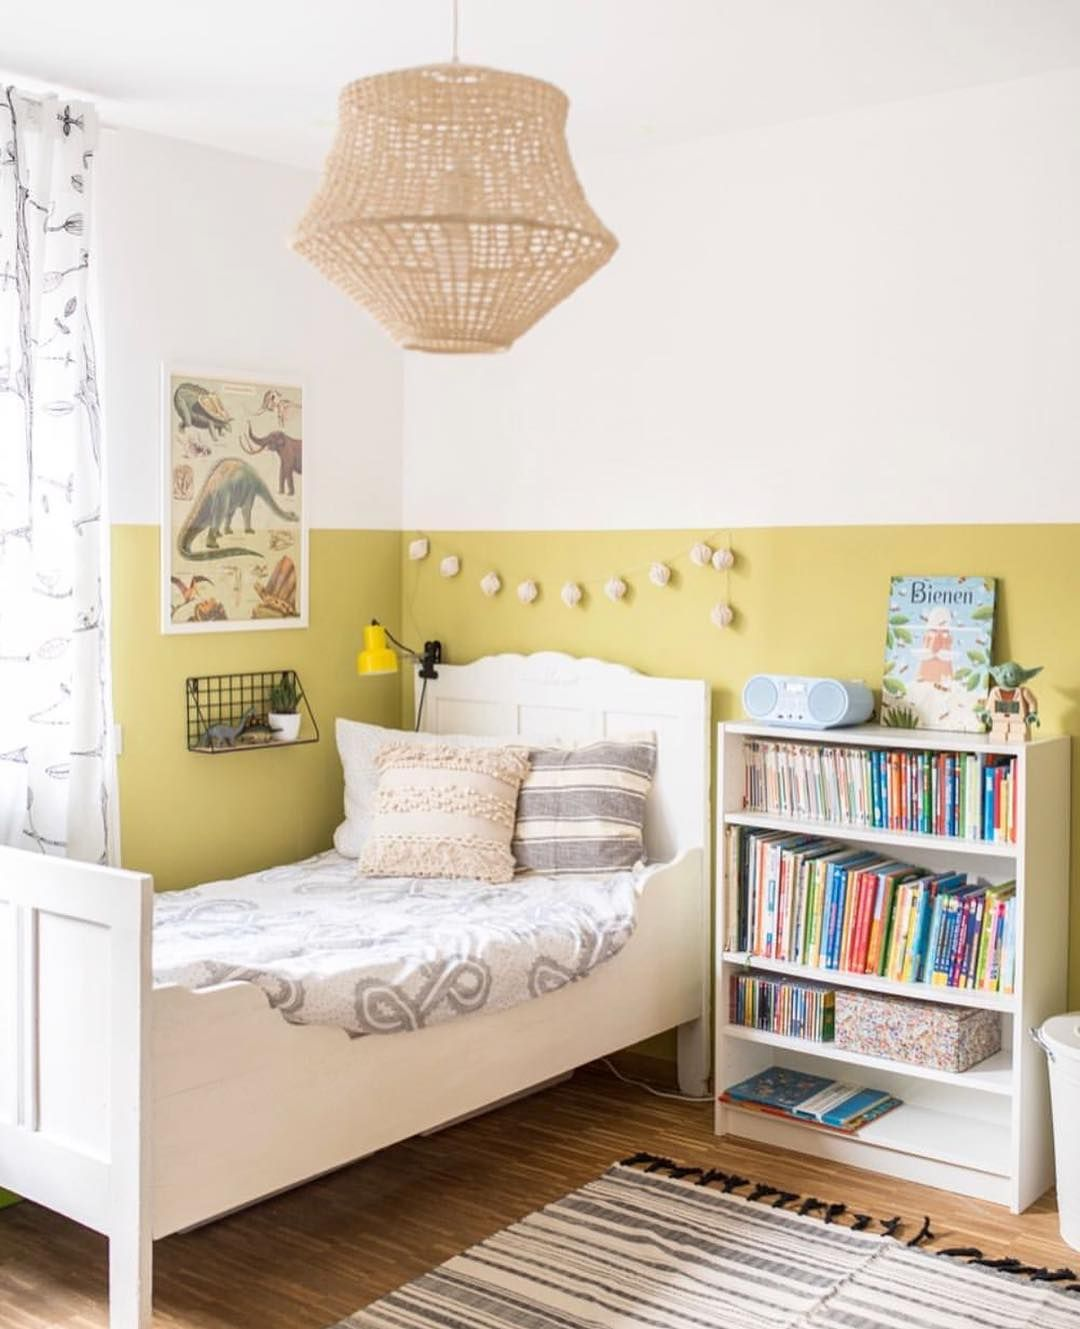 Bright Kids Room: Kids Bedroom Sets, Kids Room